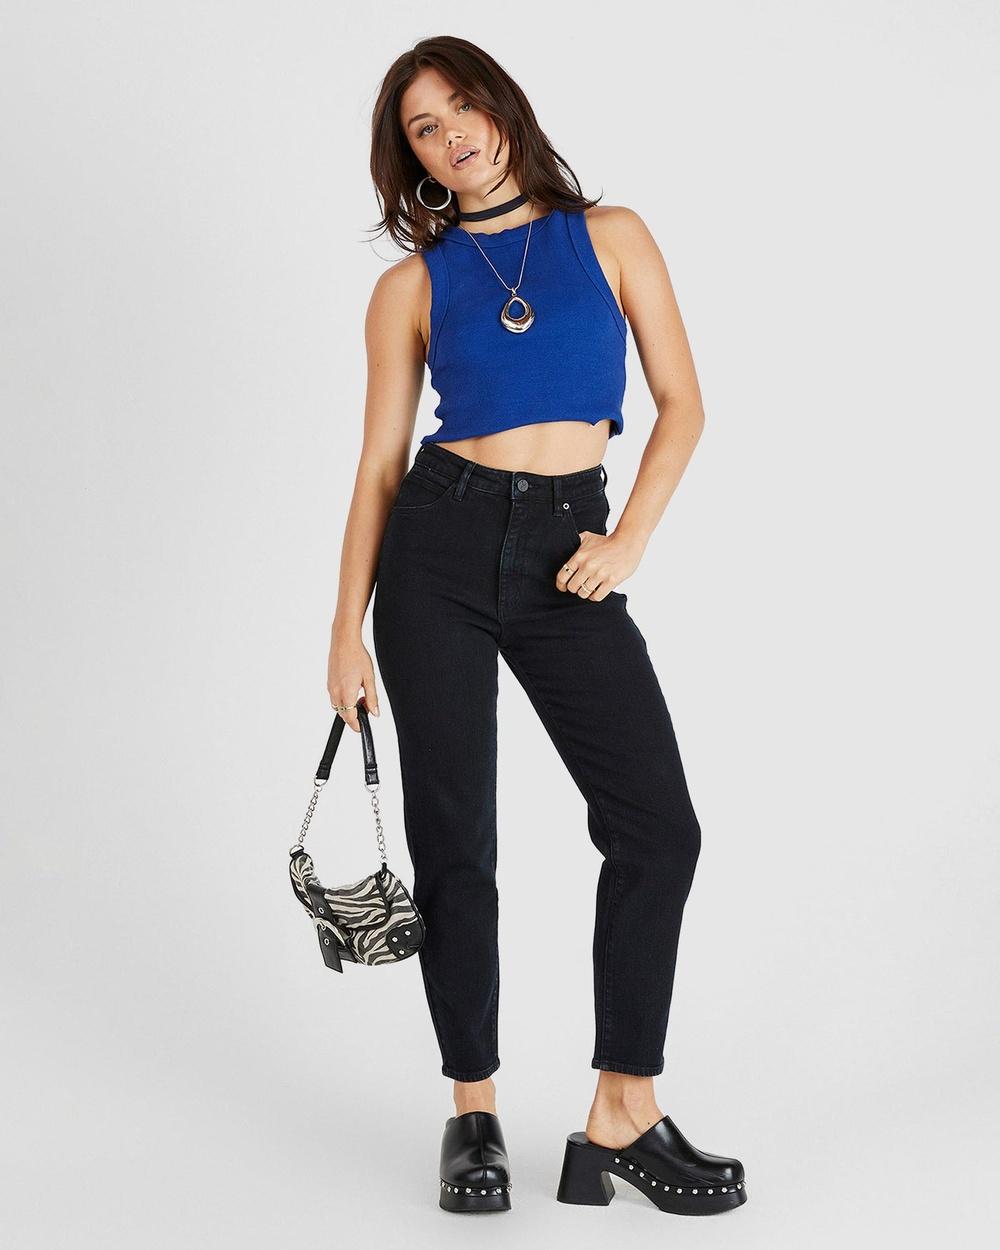 Abrand Petite A 94 High Slim Jeans Vintage 90210